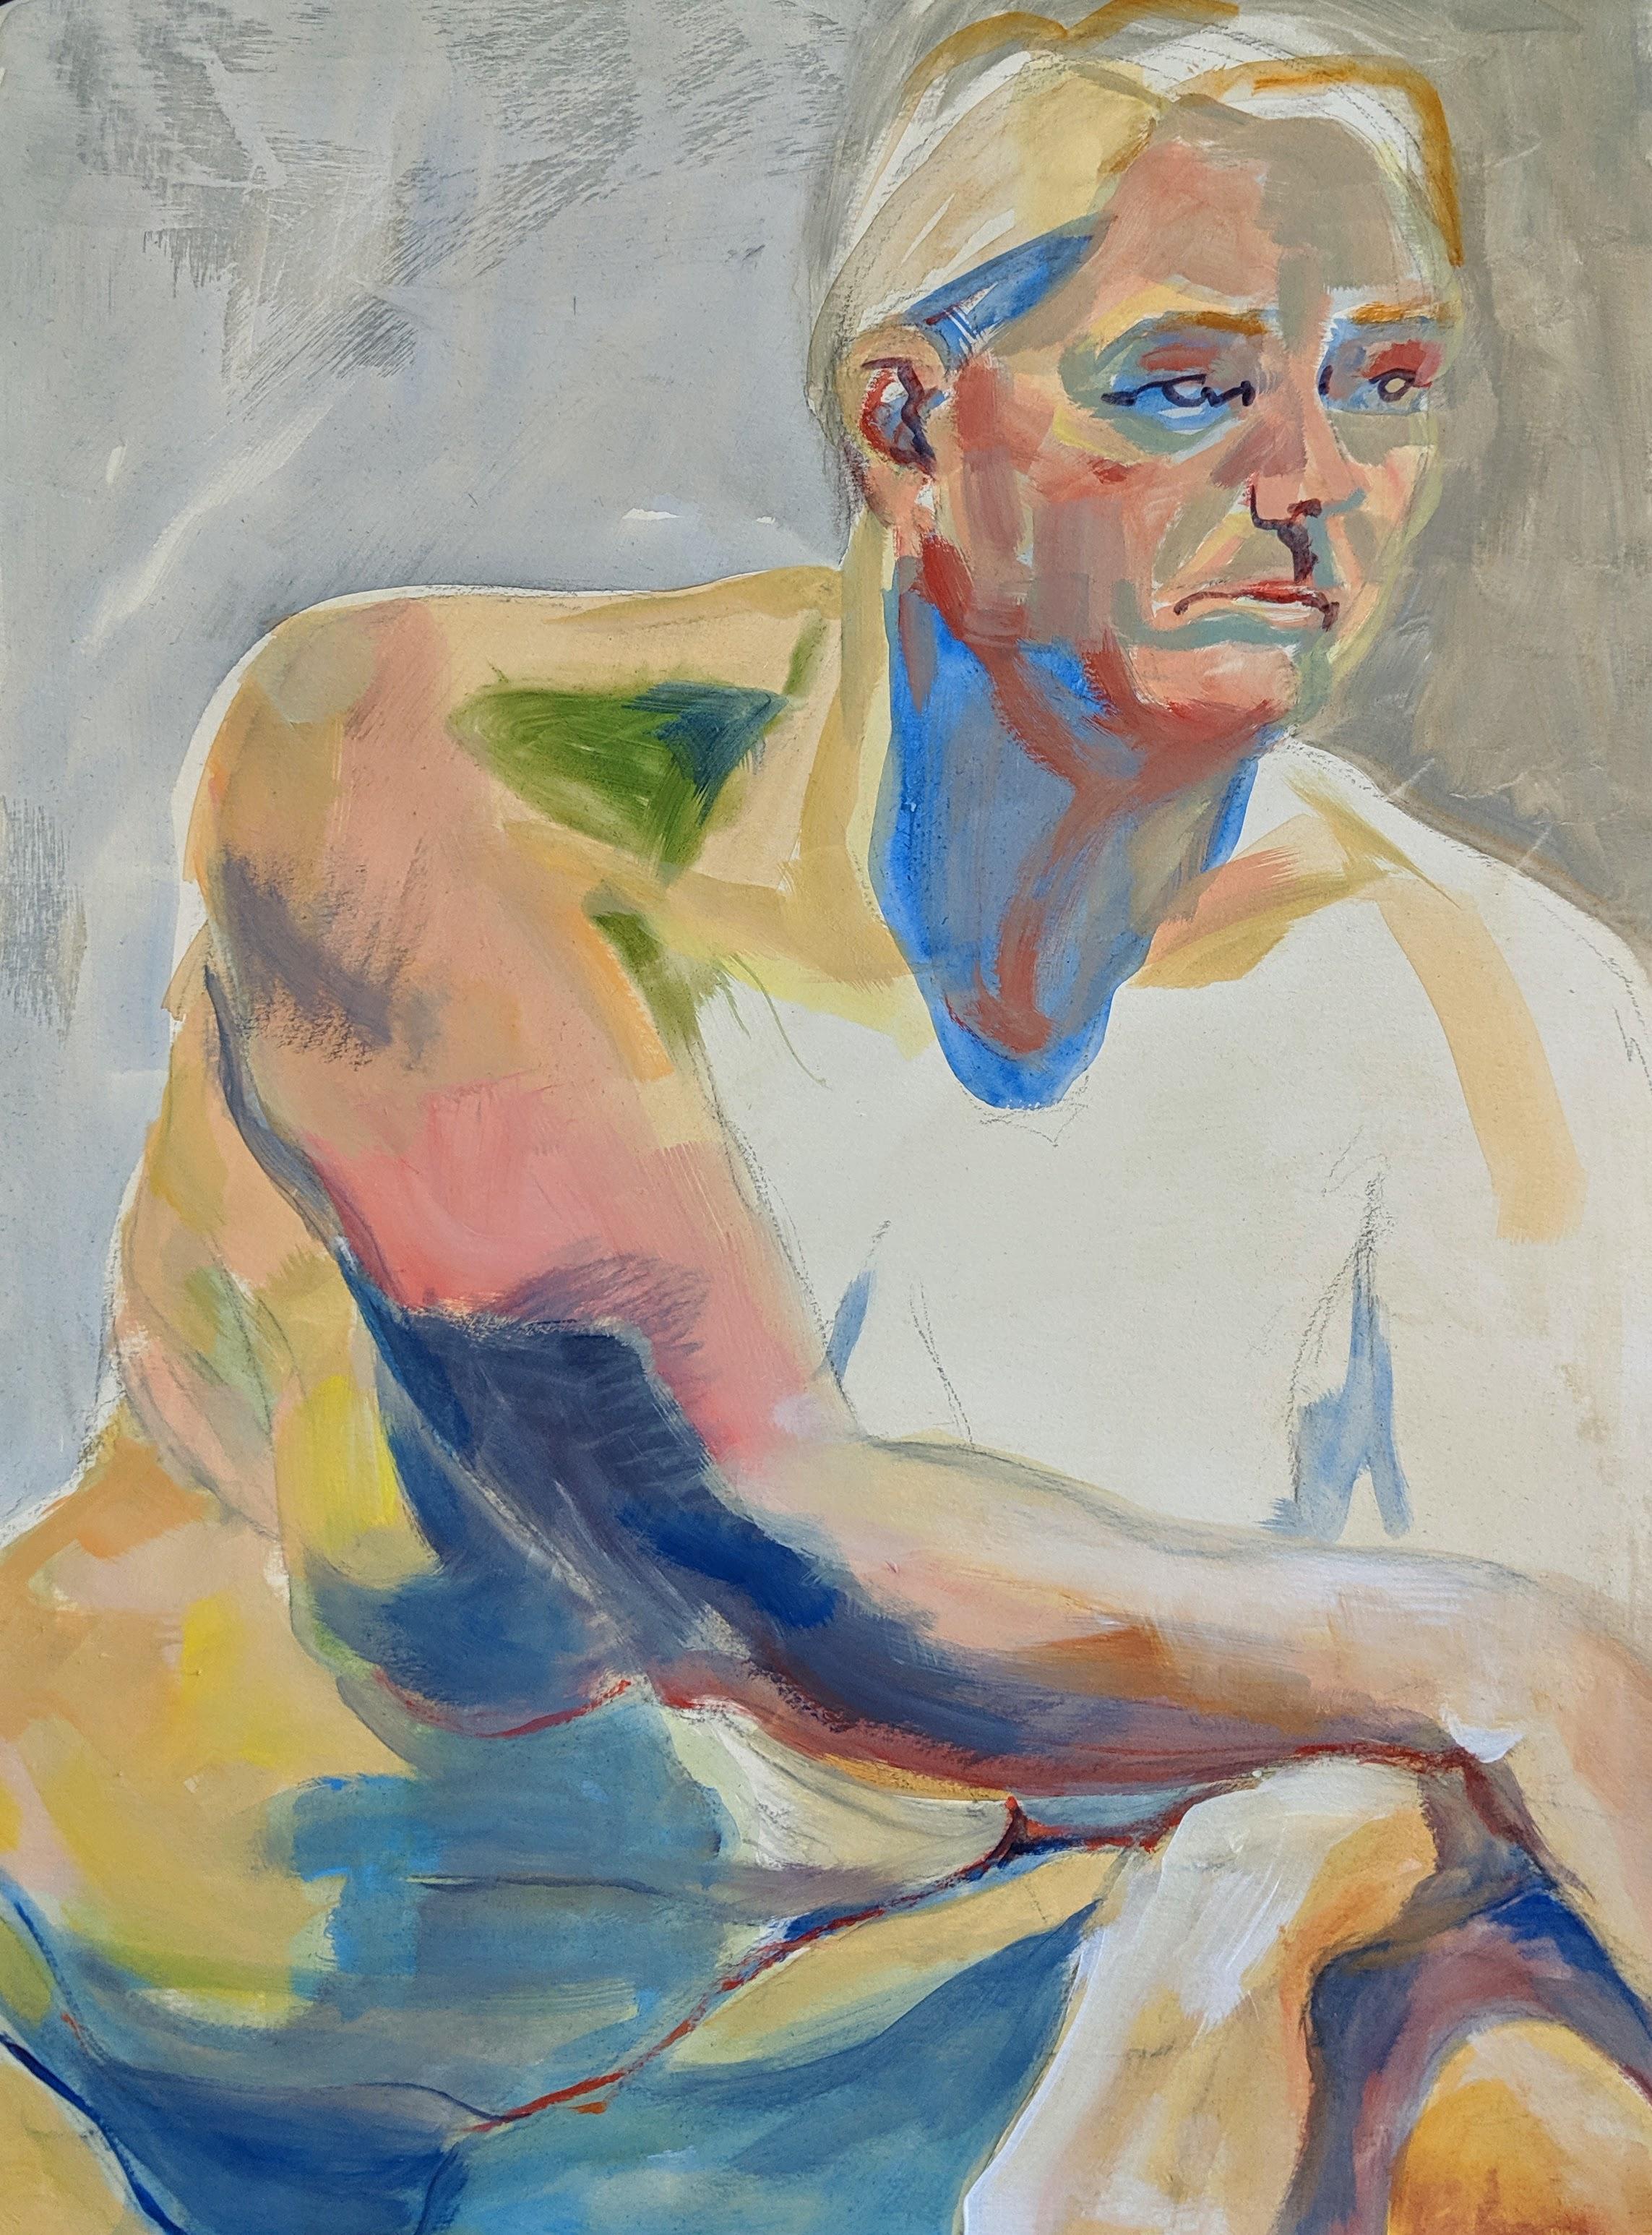 ©2019 Leslie Hannon | Figure Painting & Drawing Workshop, San Luis Obispo County (Arroyo Grande, CA) | David Limrite, Instructor